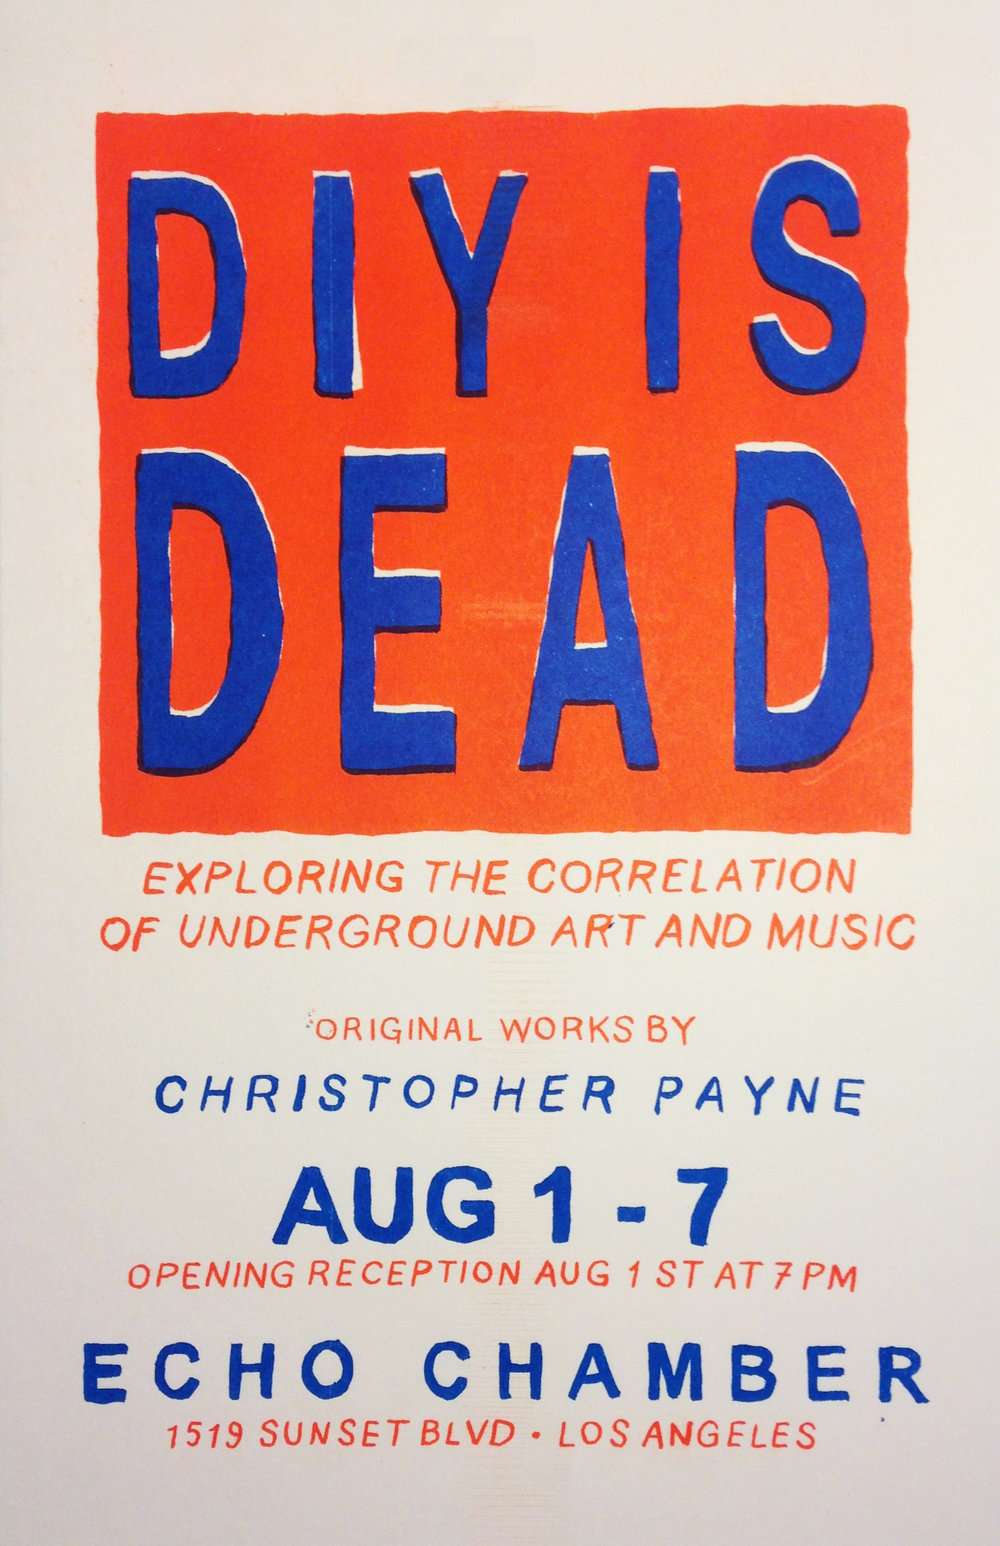 diy is dead poster.jpg